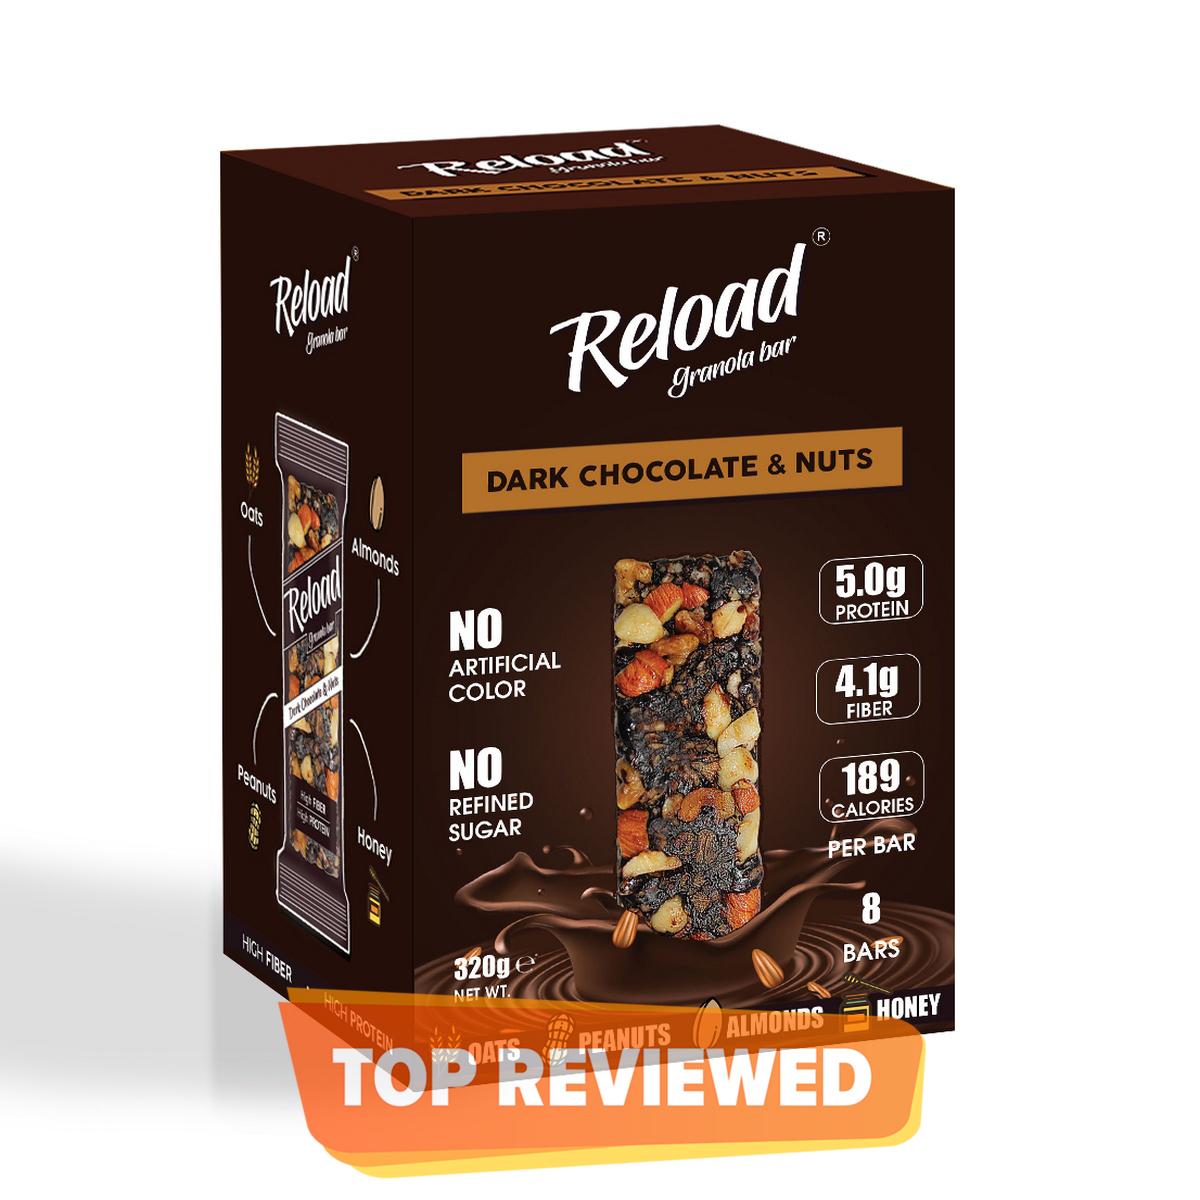 Reload Granola Bar - Protein Bar - Dark Chocolate & Nuts - Box (8 Bars)